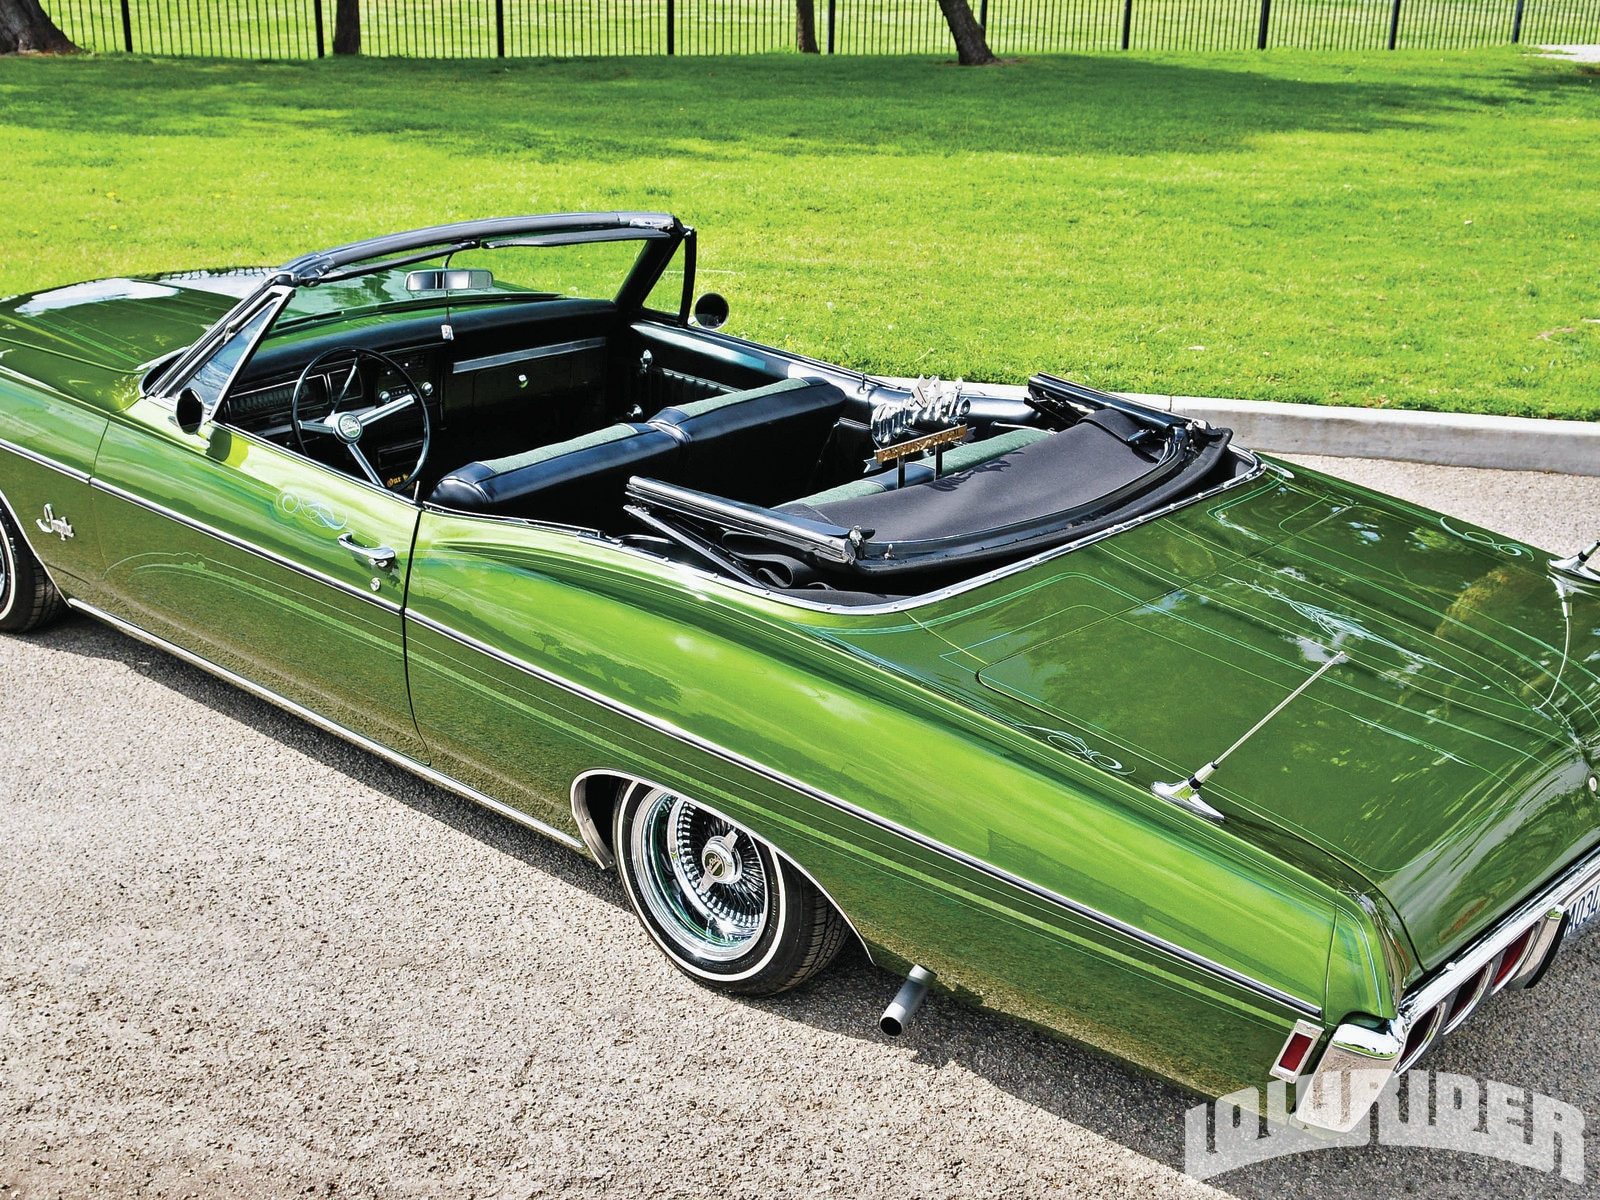 1968 Chevrolet Impala Convertible Lowrider Magazine